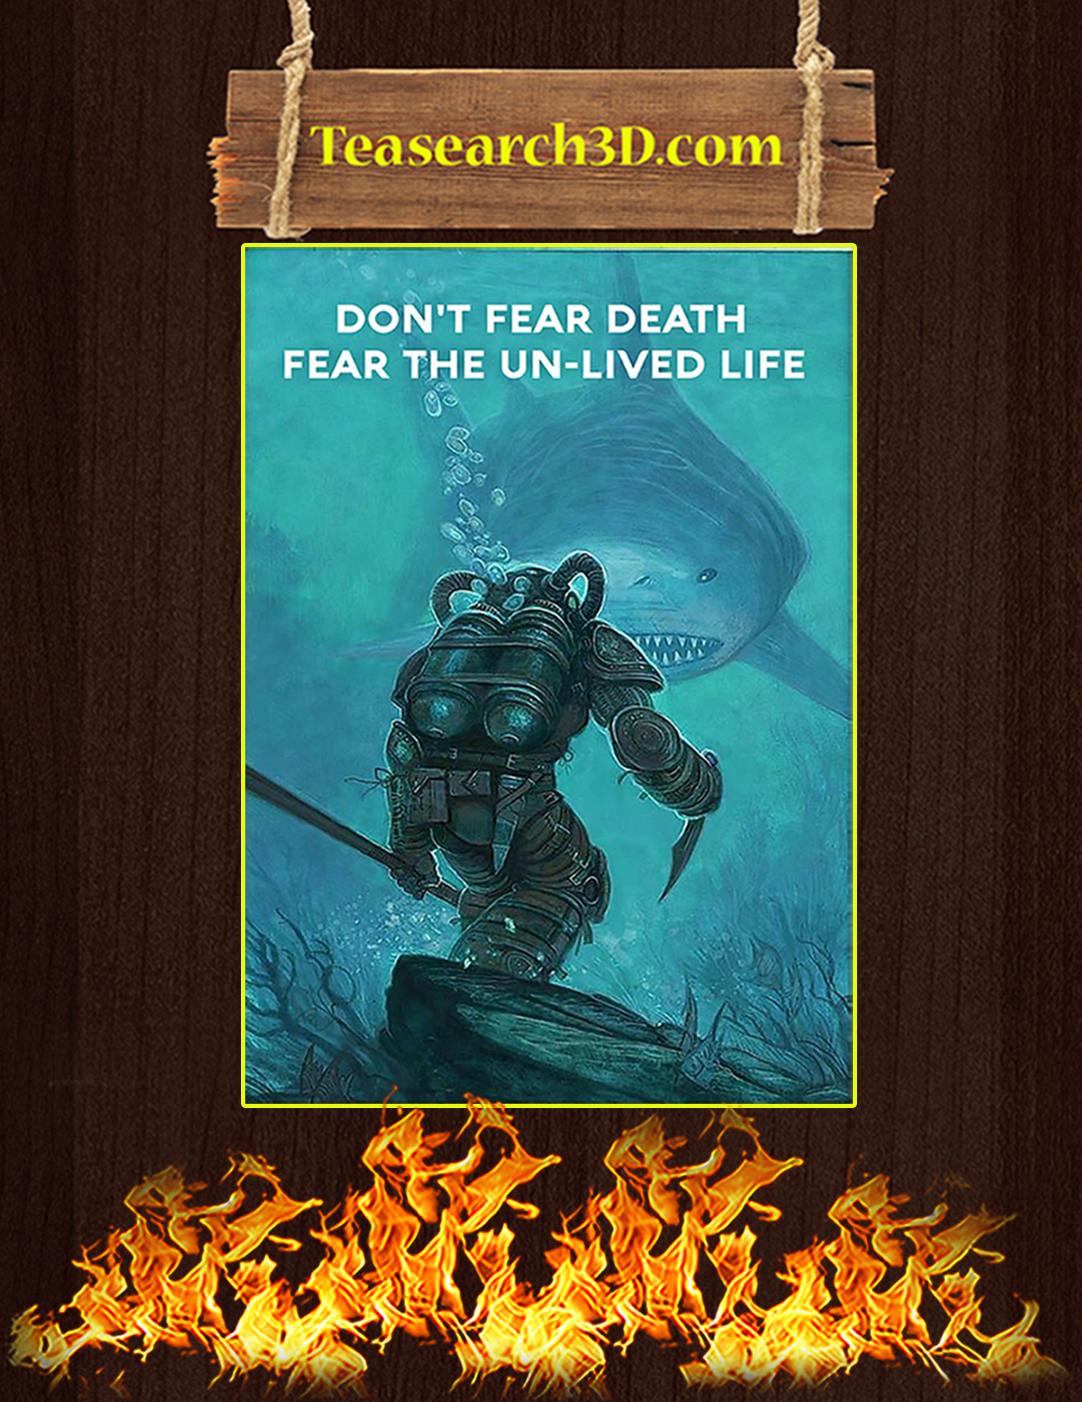 Scuba diving Don't fear death fear the un-lived life poster A2